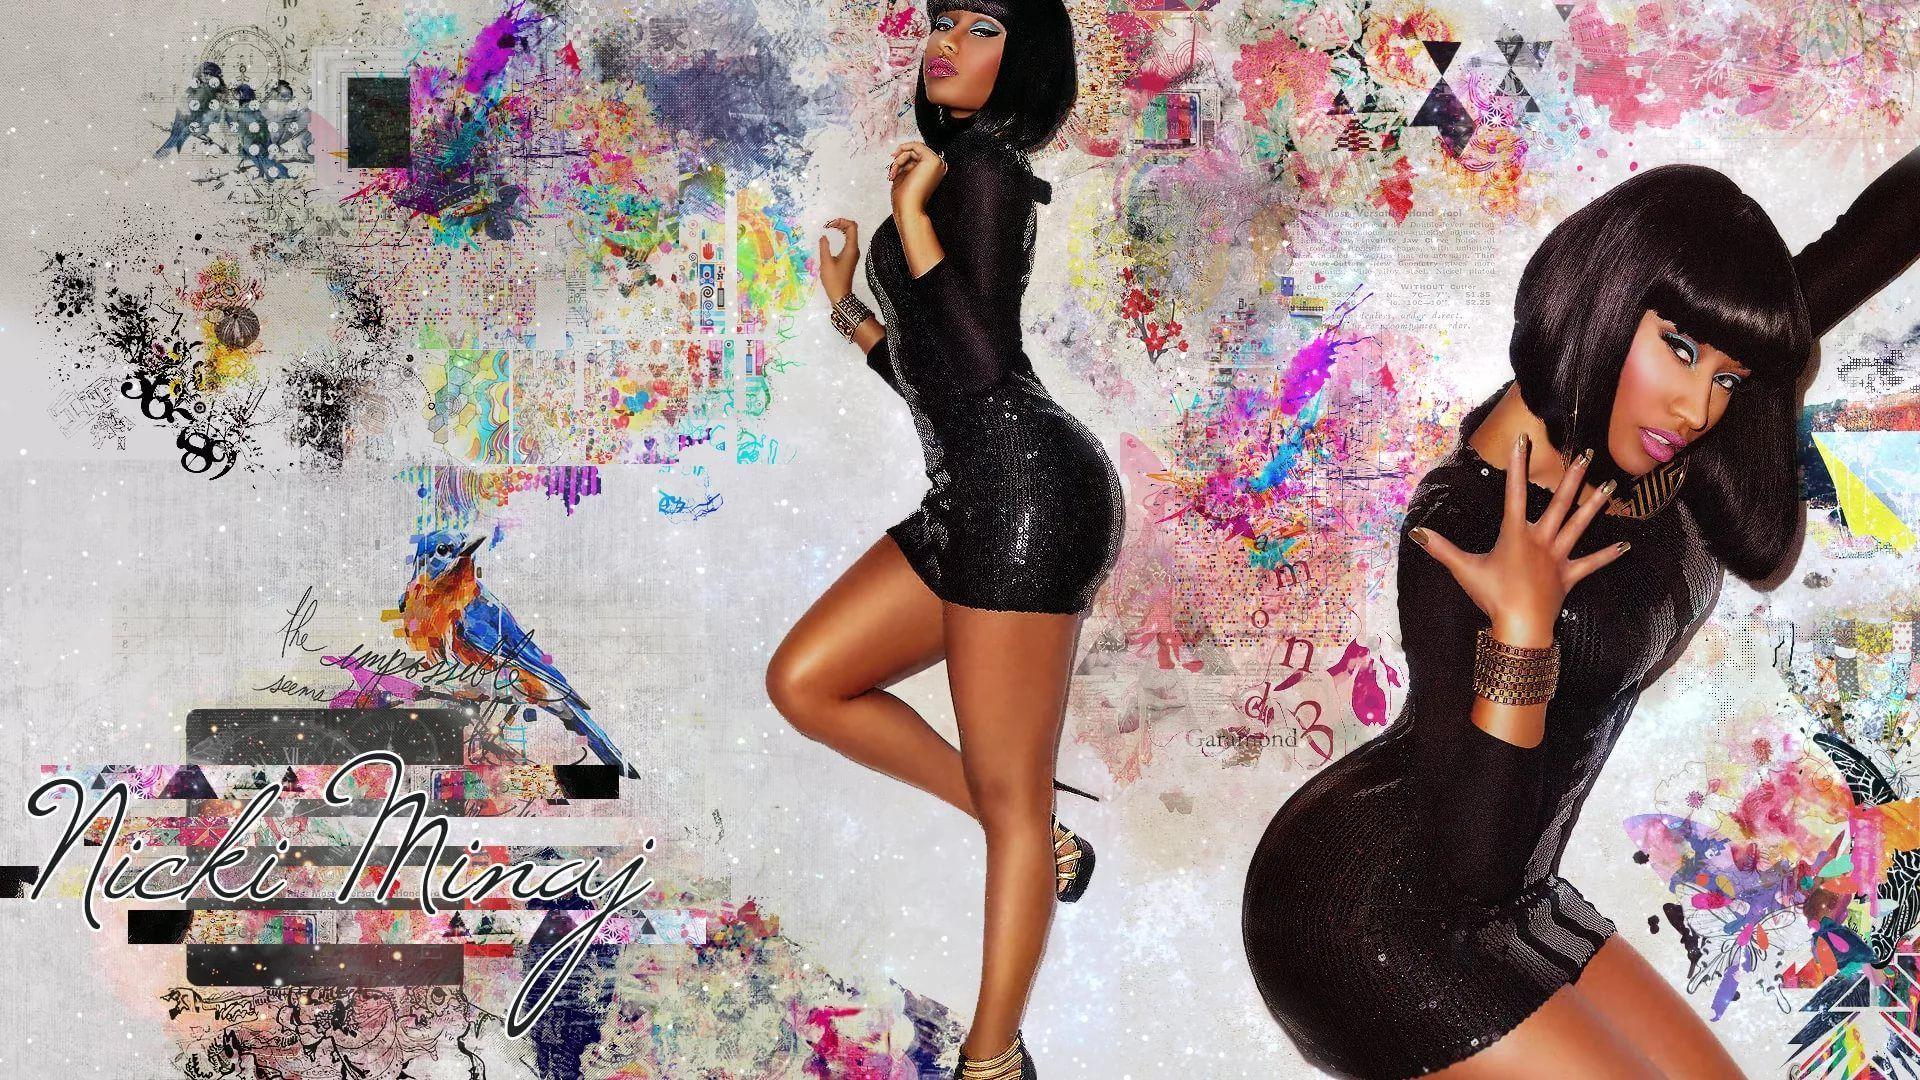 Nicki Minaj full wallpaper